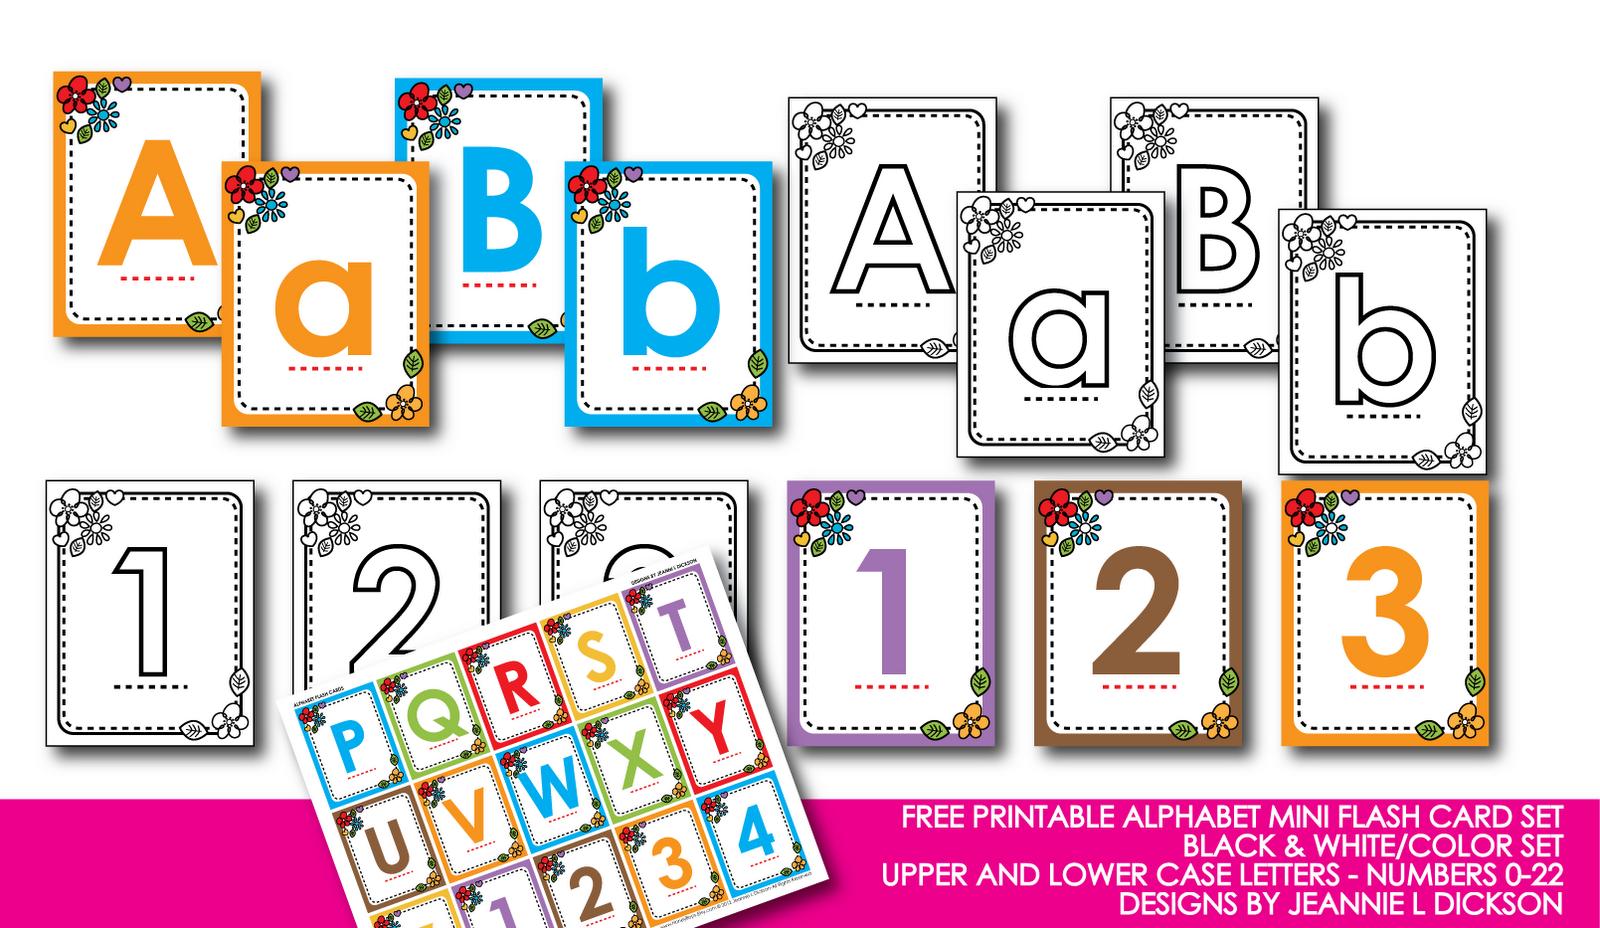 Honeybops Free Printable Alphabet Mini Flash Card Set